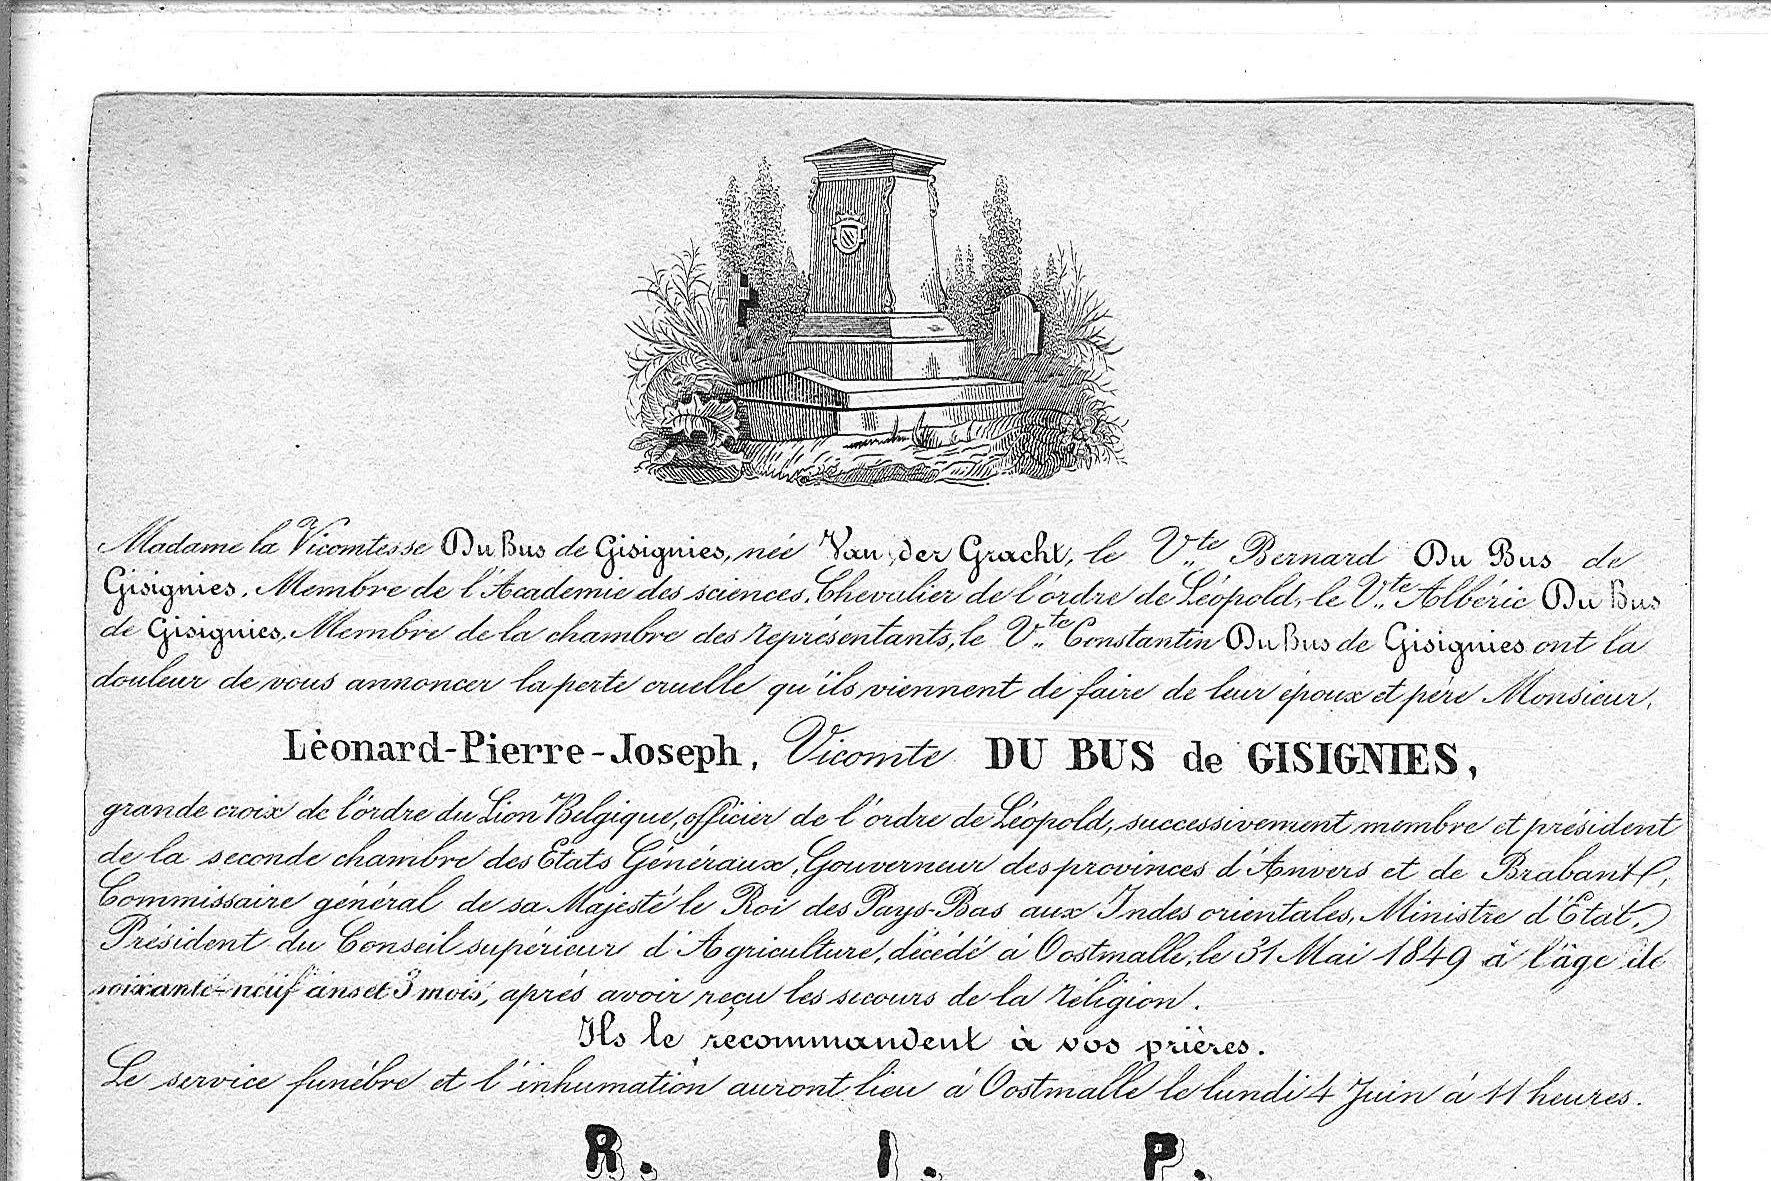 Leonard-Pierre-Joseph-(1849)-20121107140116_00060.jpg